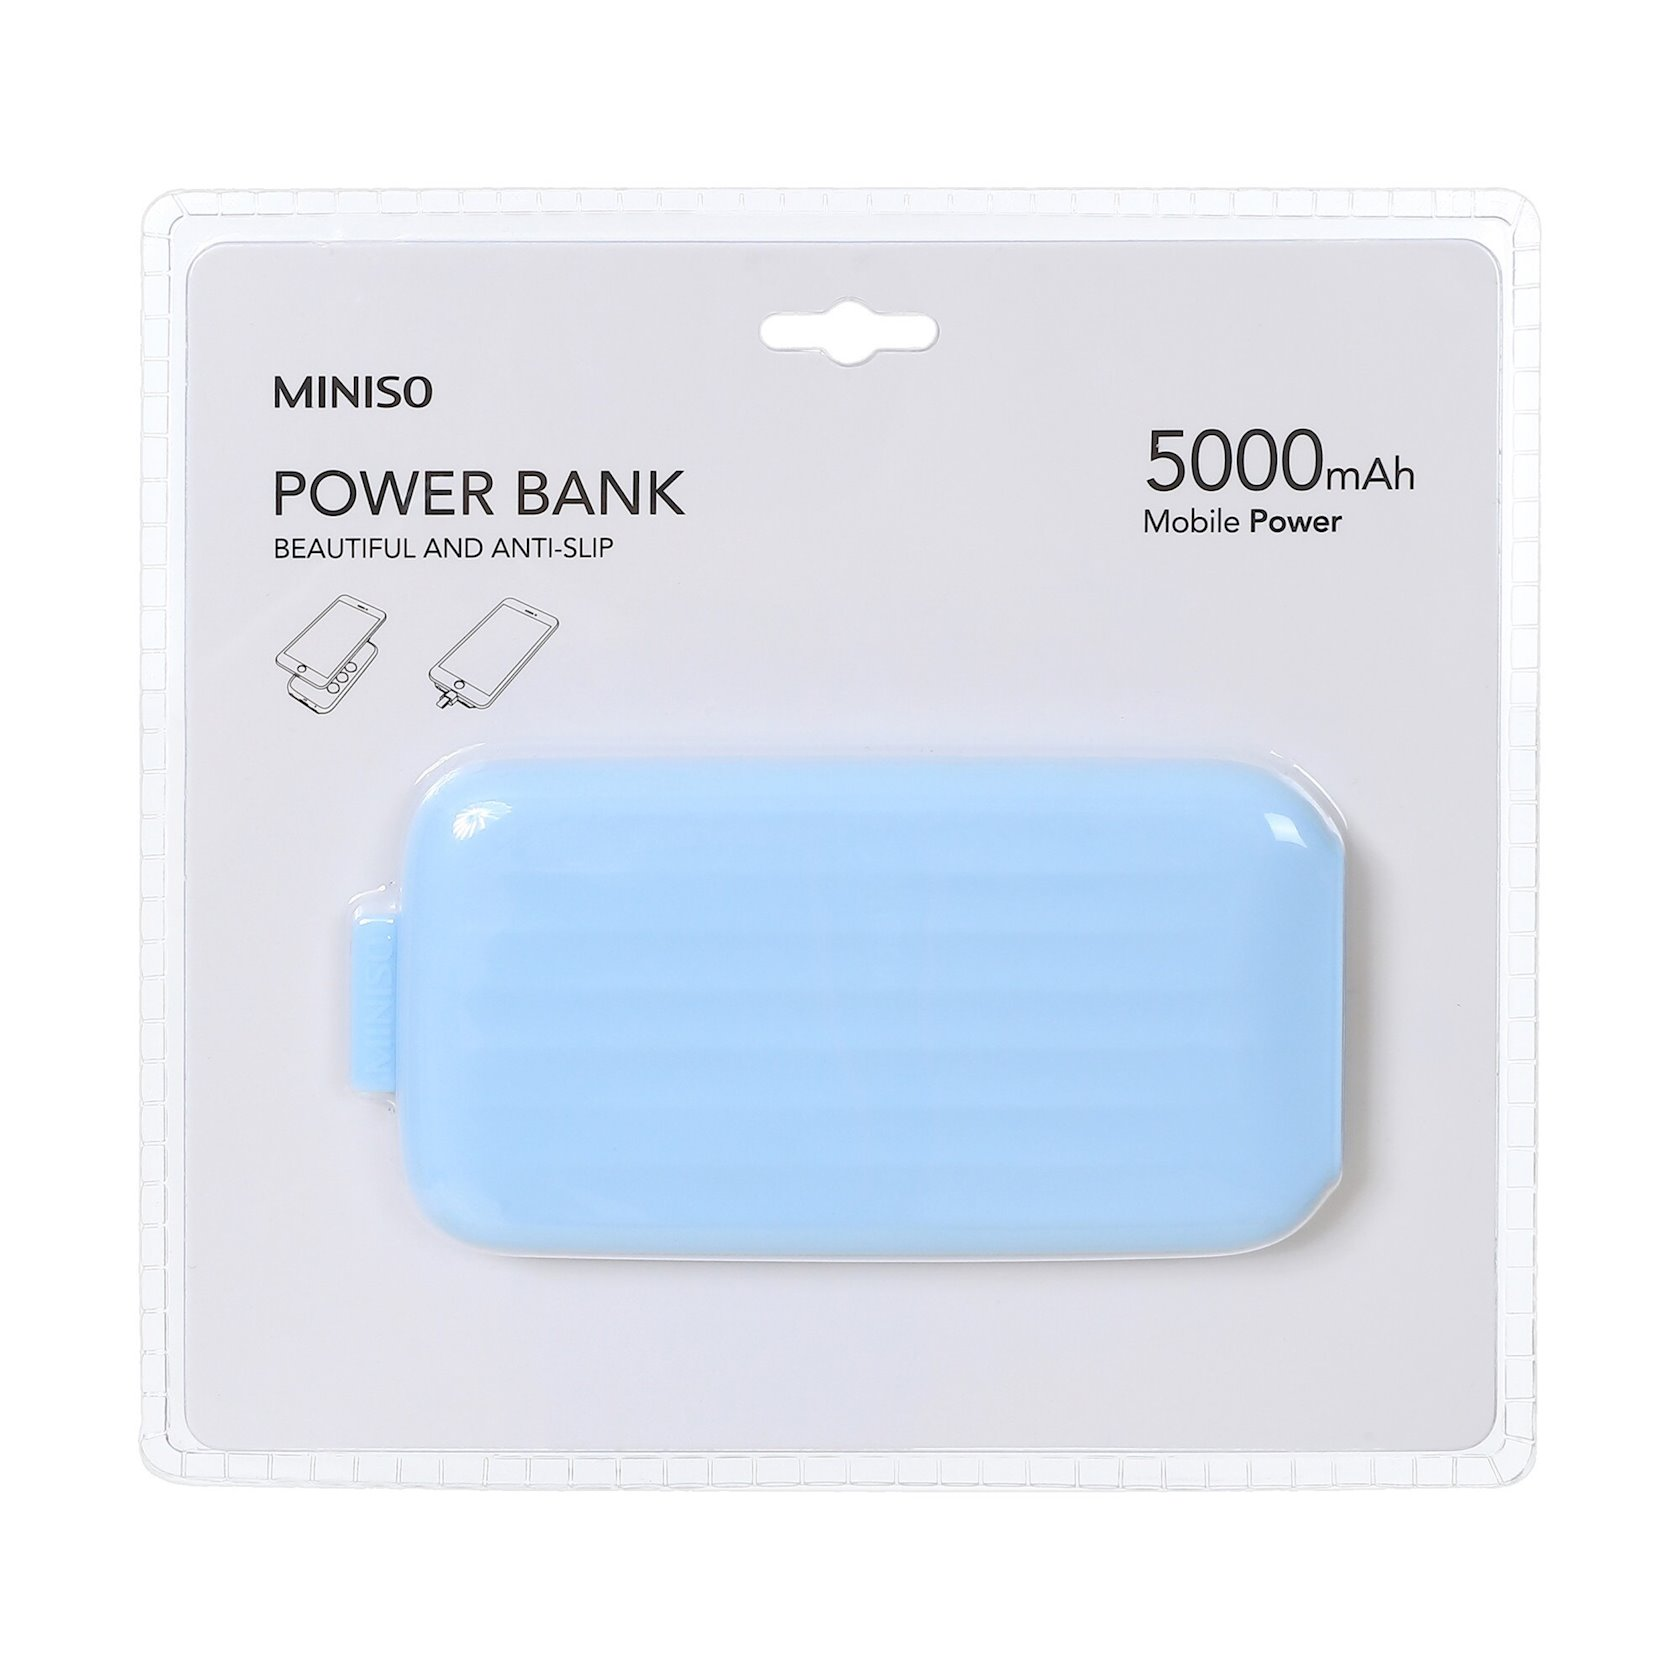 Portativ enerji toplama cihazı Miniso Portable Power Bank with Suction Cup 5000mAhModel: MC-011 (Blue)